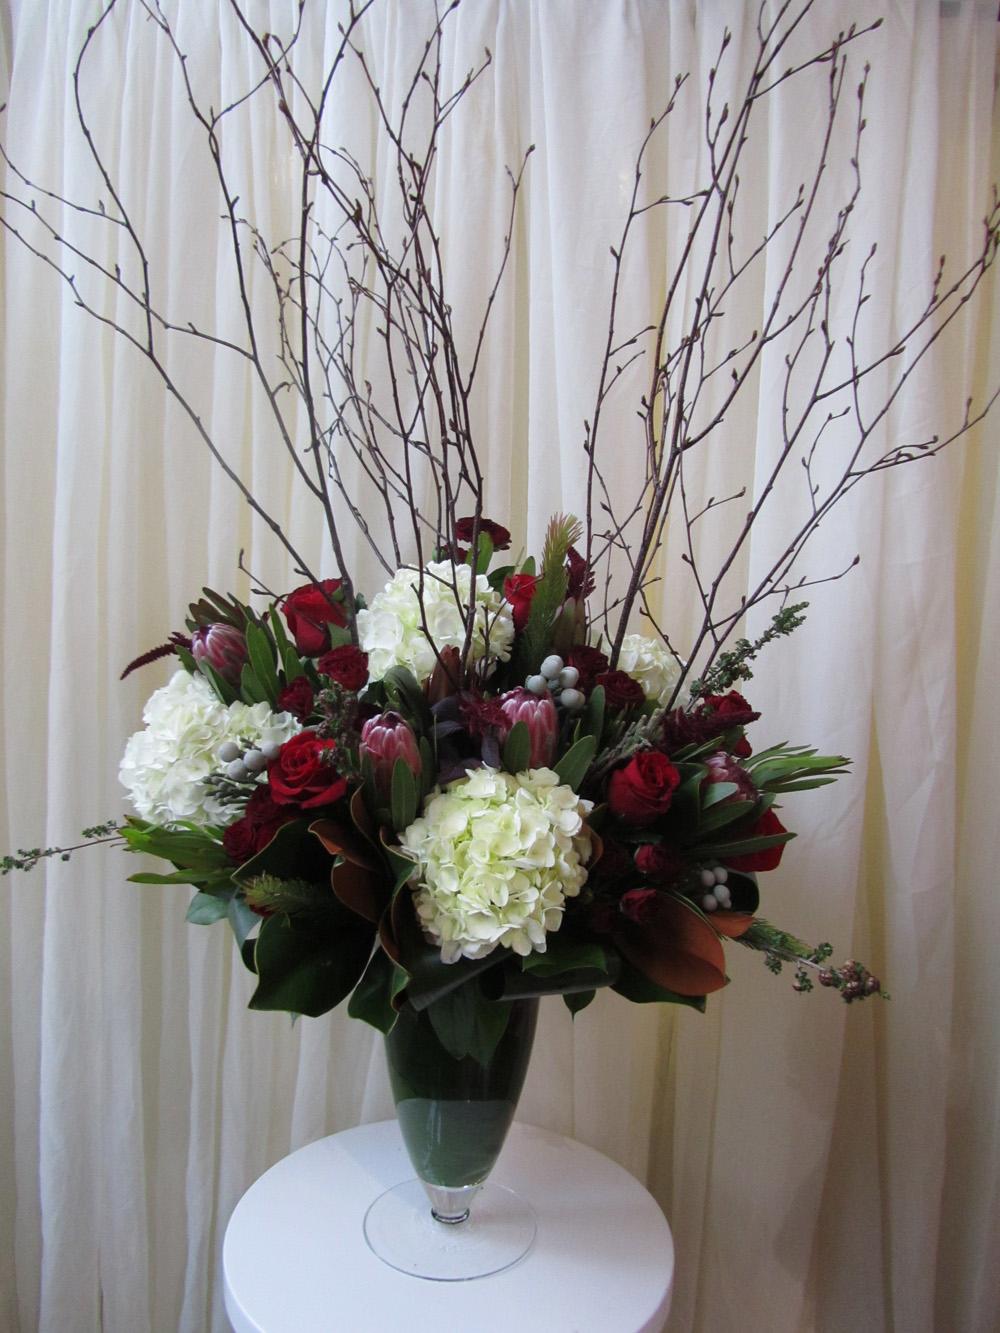 Flowers primavera flowers more ltd holidays izmirmasajfo